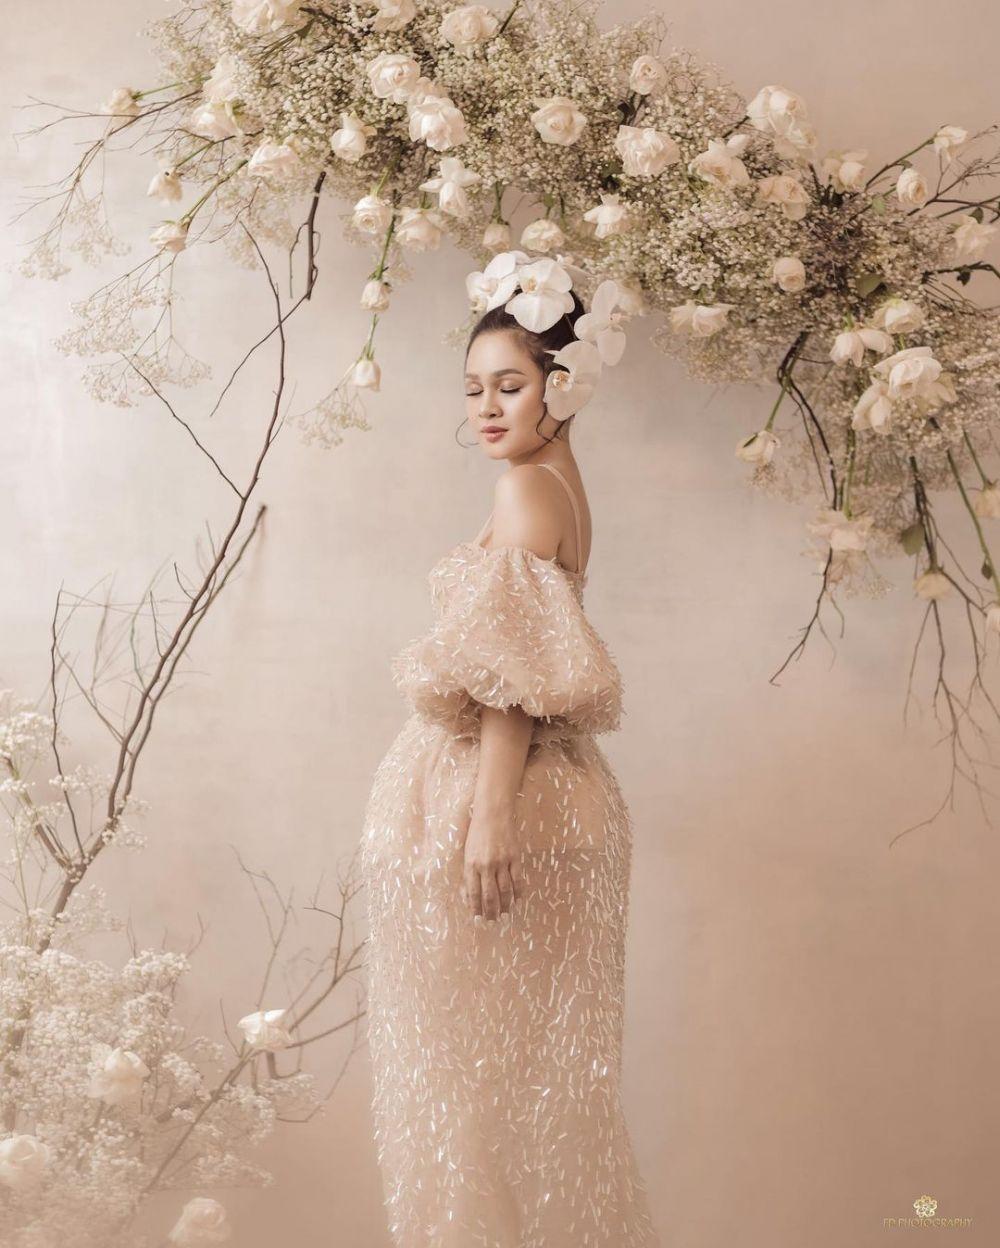 Andien potret floral © Instagram